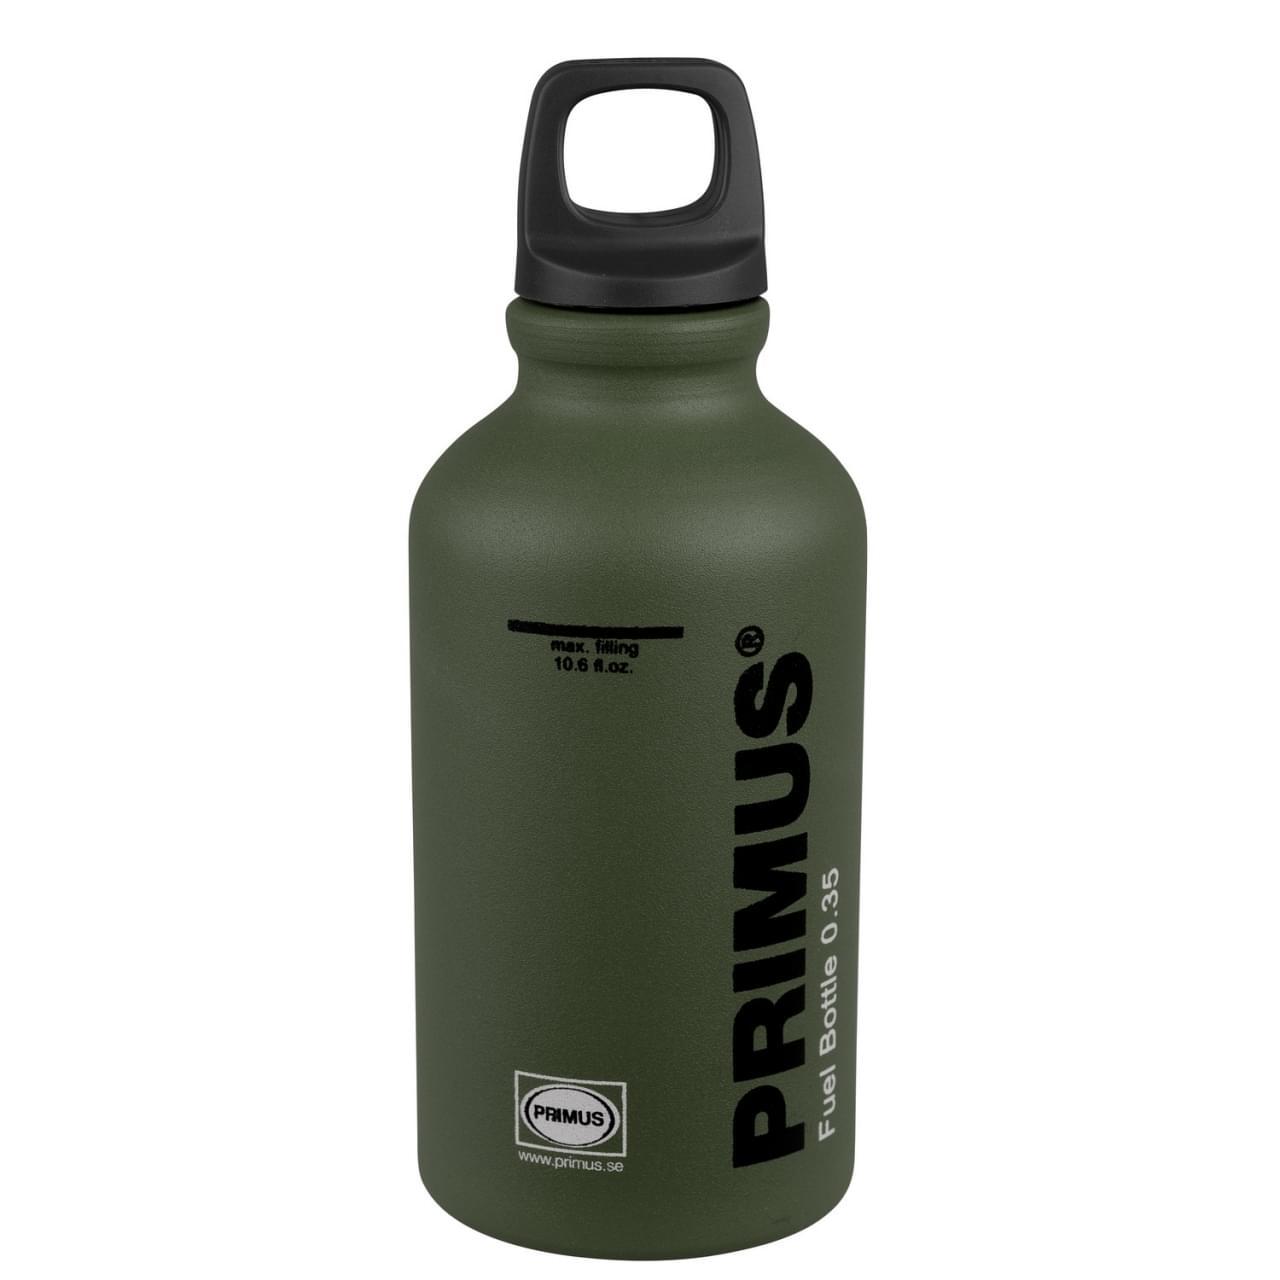 Primus Fuel Bottle 0.35 Brandstoffles